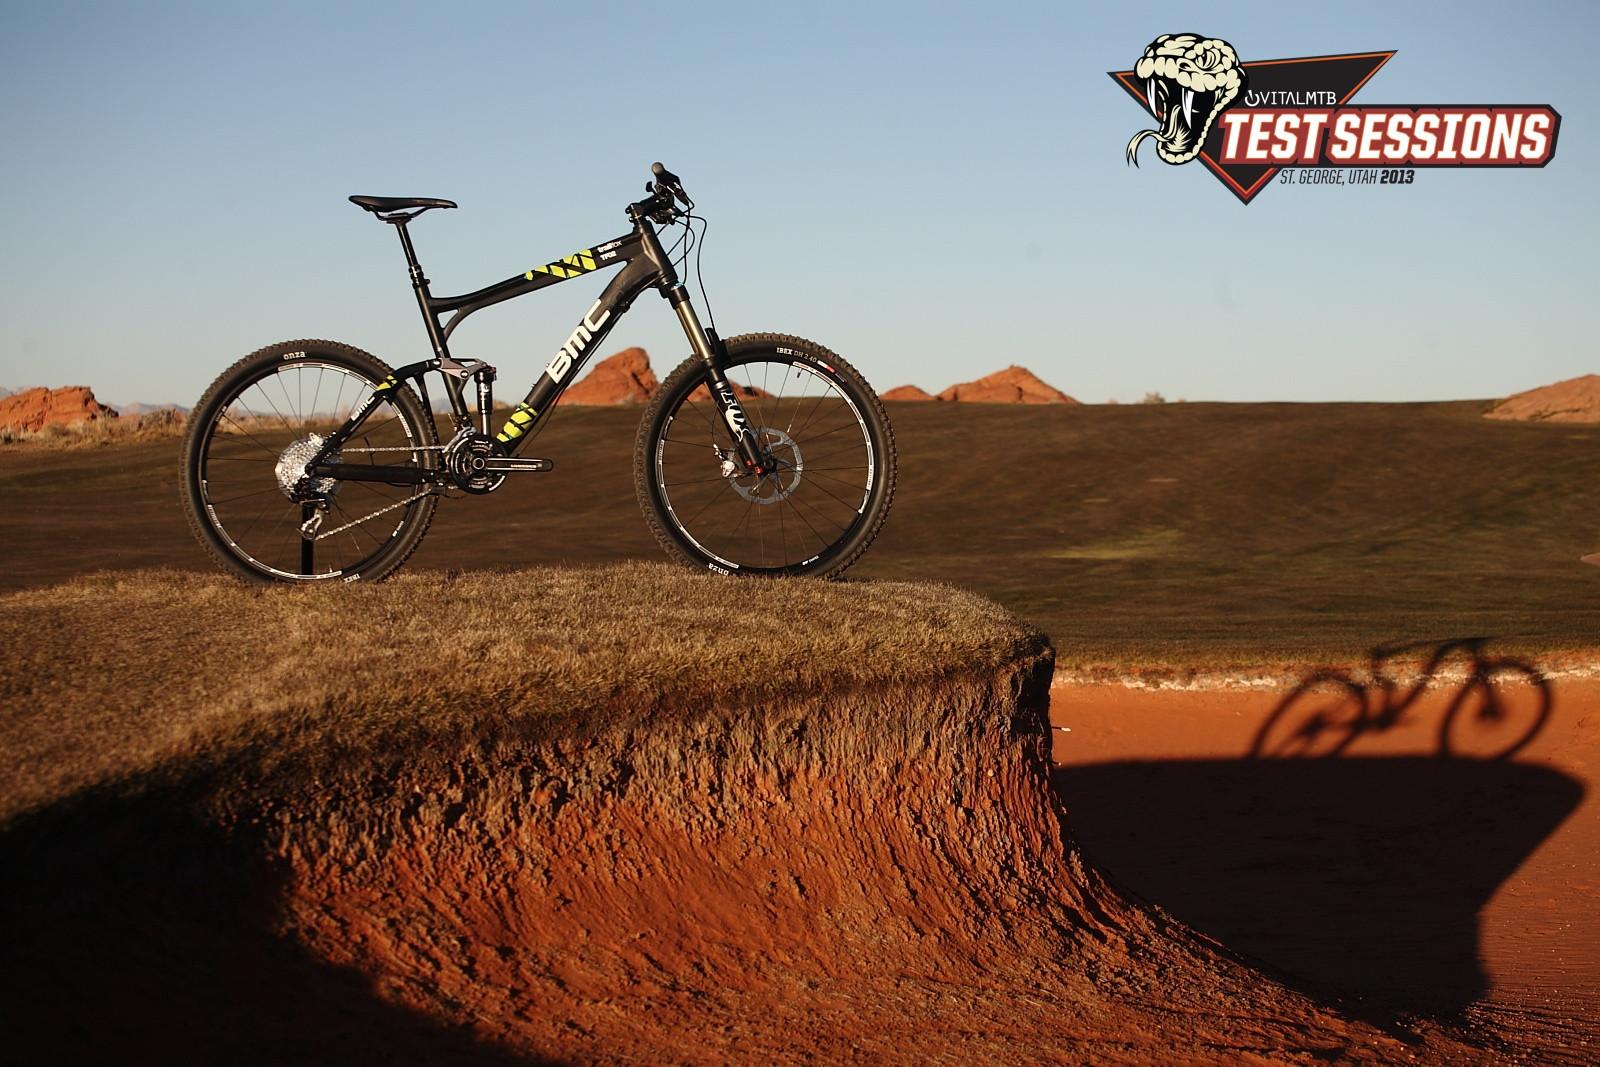 2013 BMC Trailfox TF02 Trailcrew - 2013 BMC Trailfox TF02 Trailcrew - Mountain Biking Pictures - Vital MTB